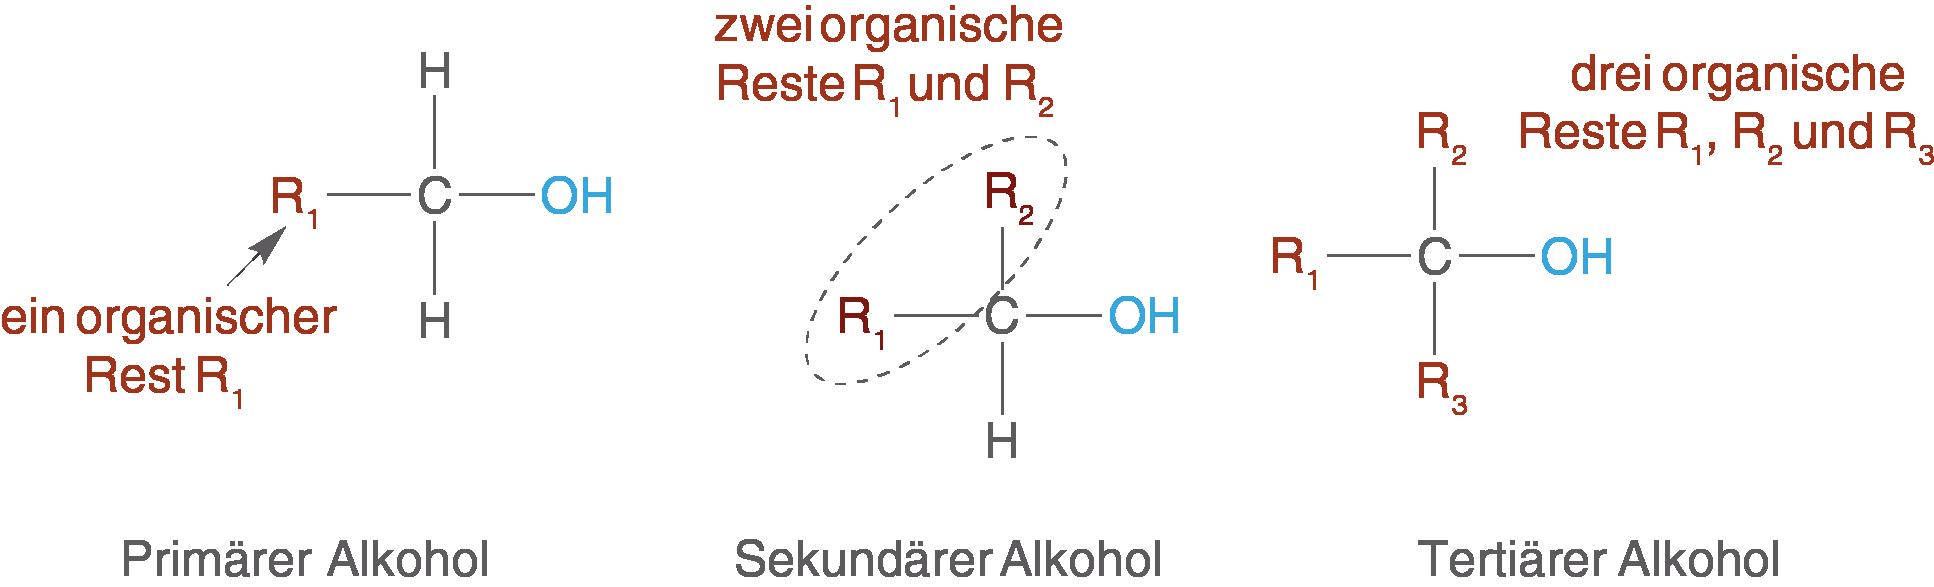 Stoffklassen: Alkohole